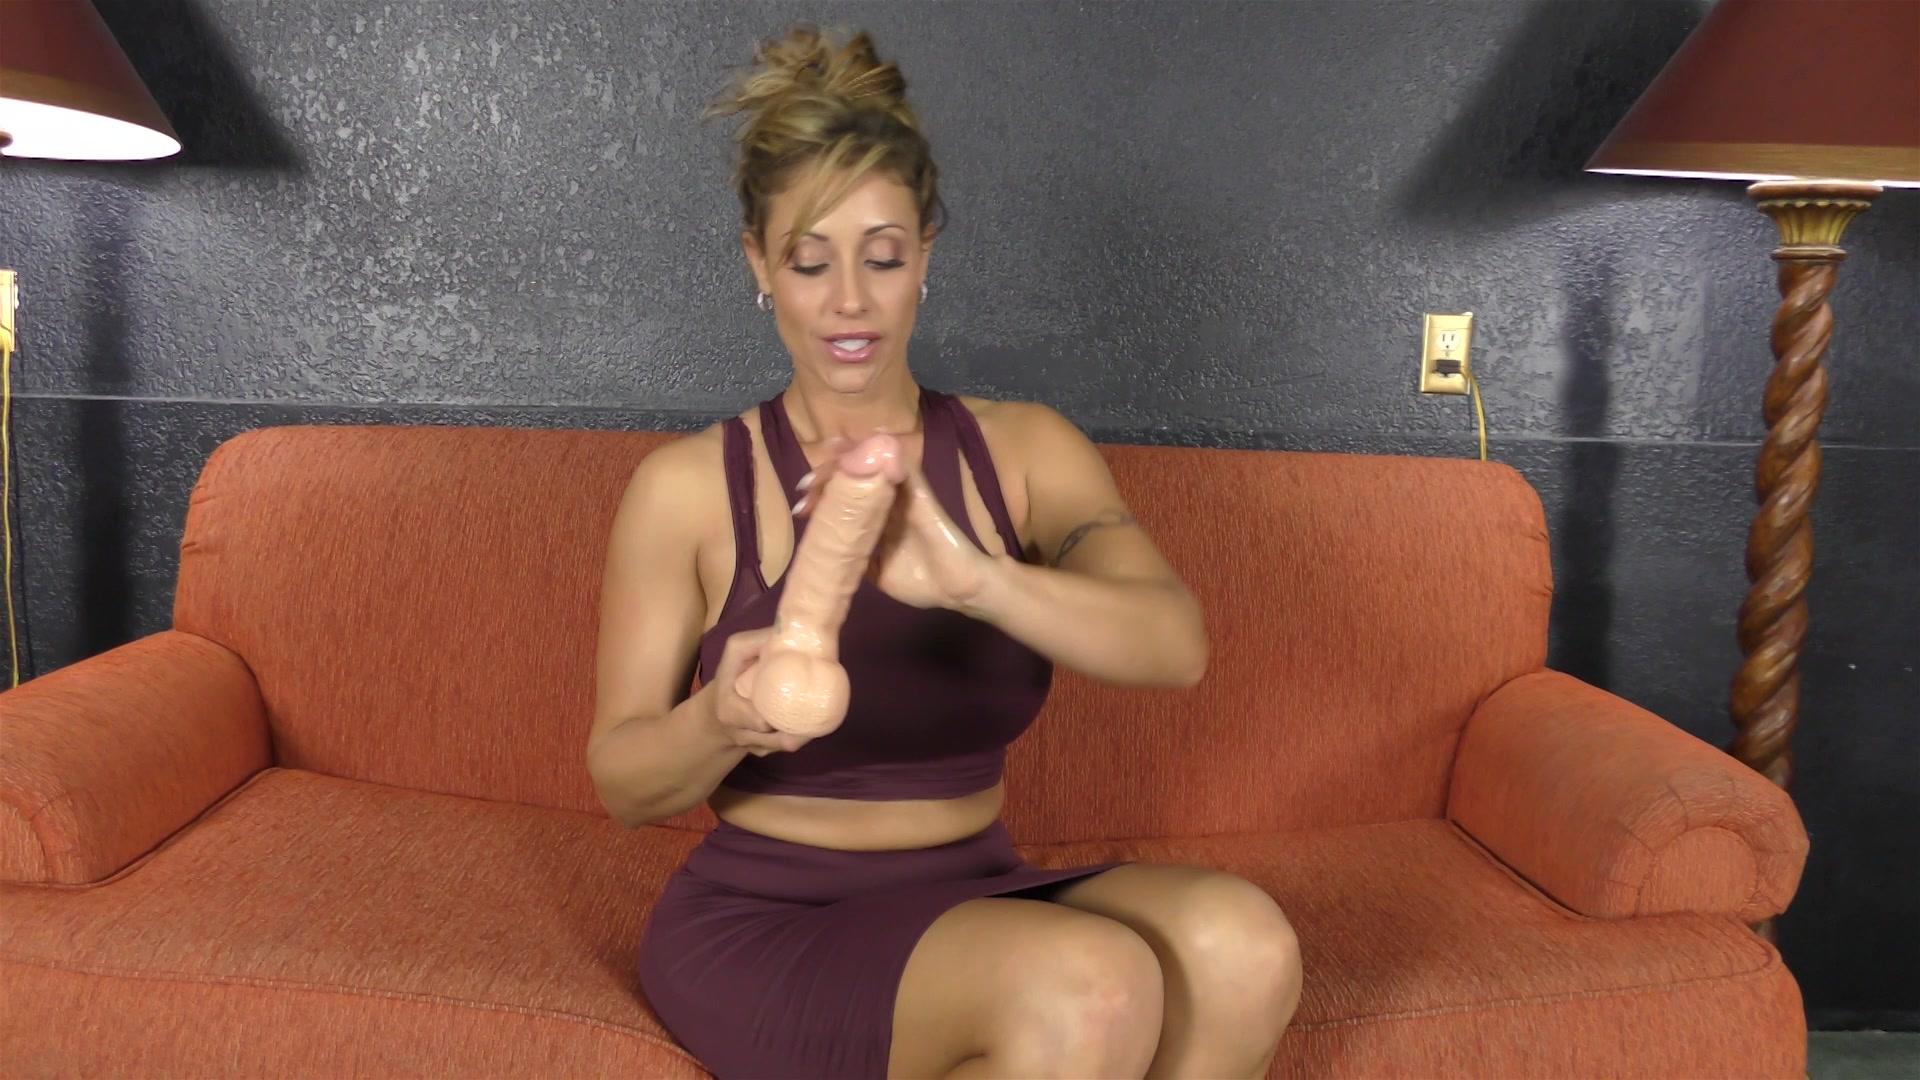 Joi Jerk Off Instructions Venus Girls Unlimited Streaming